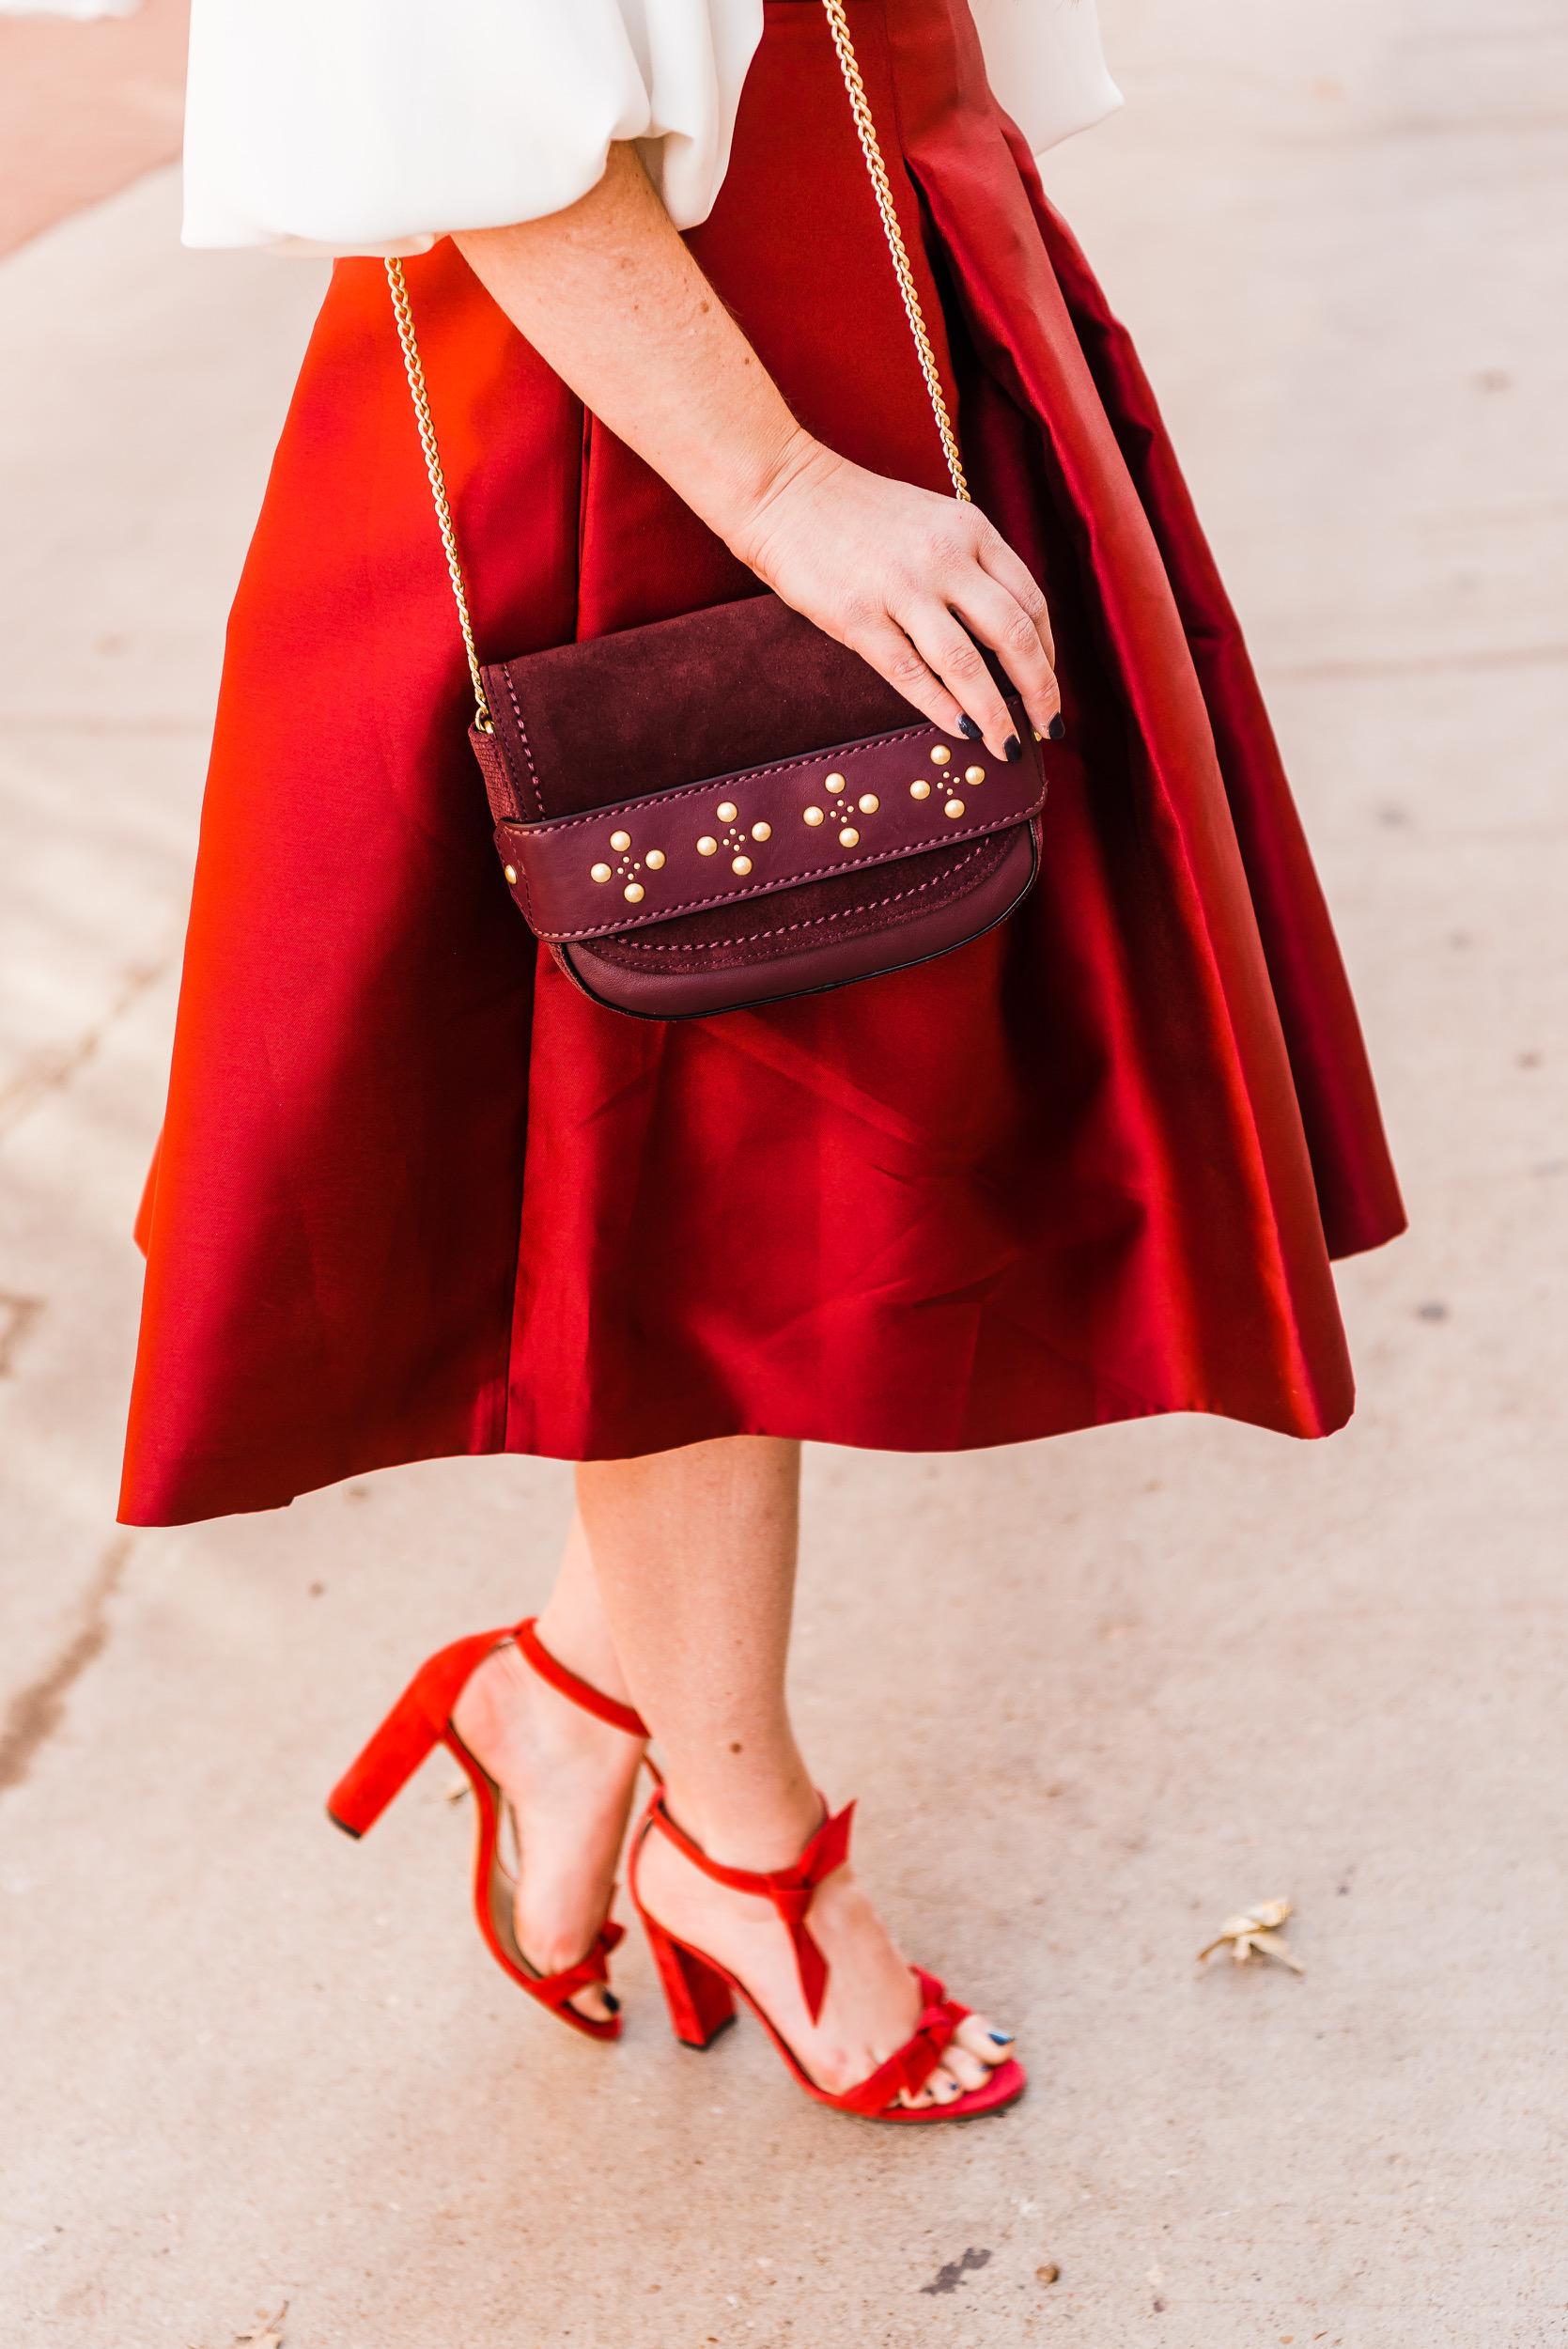 c2a171d393 ... Crossbody Vera Bradley Bag by popular East Memphis fashion blogger  Walking in Memphis in High Heels ...